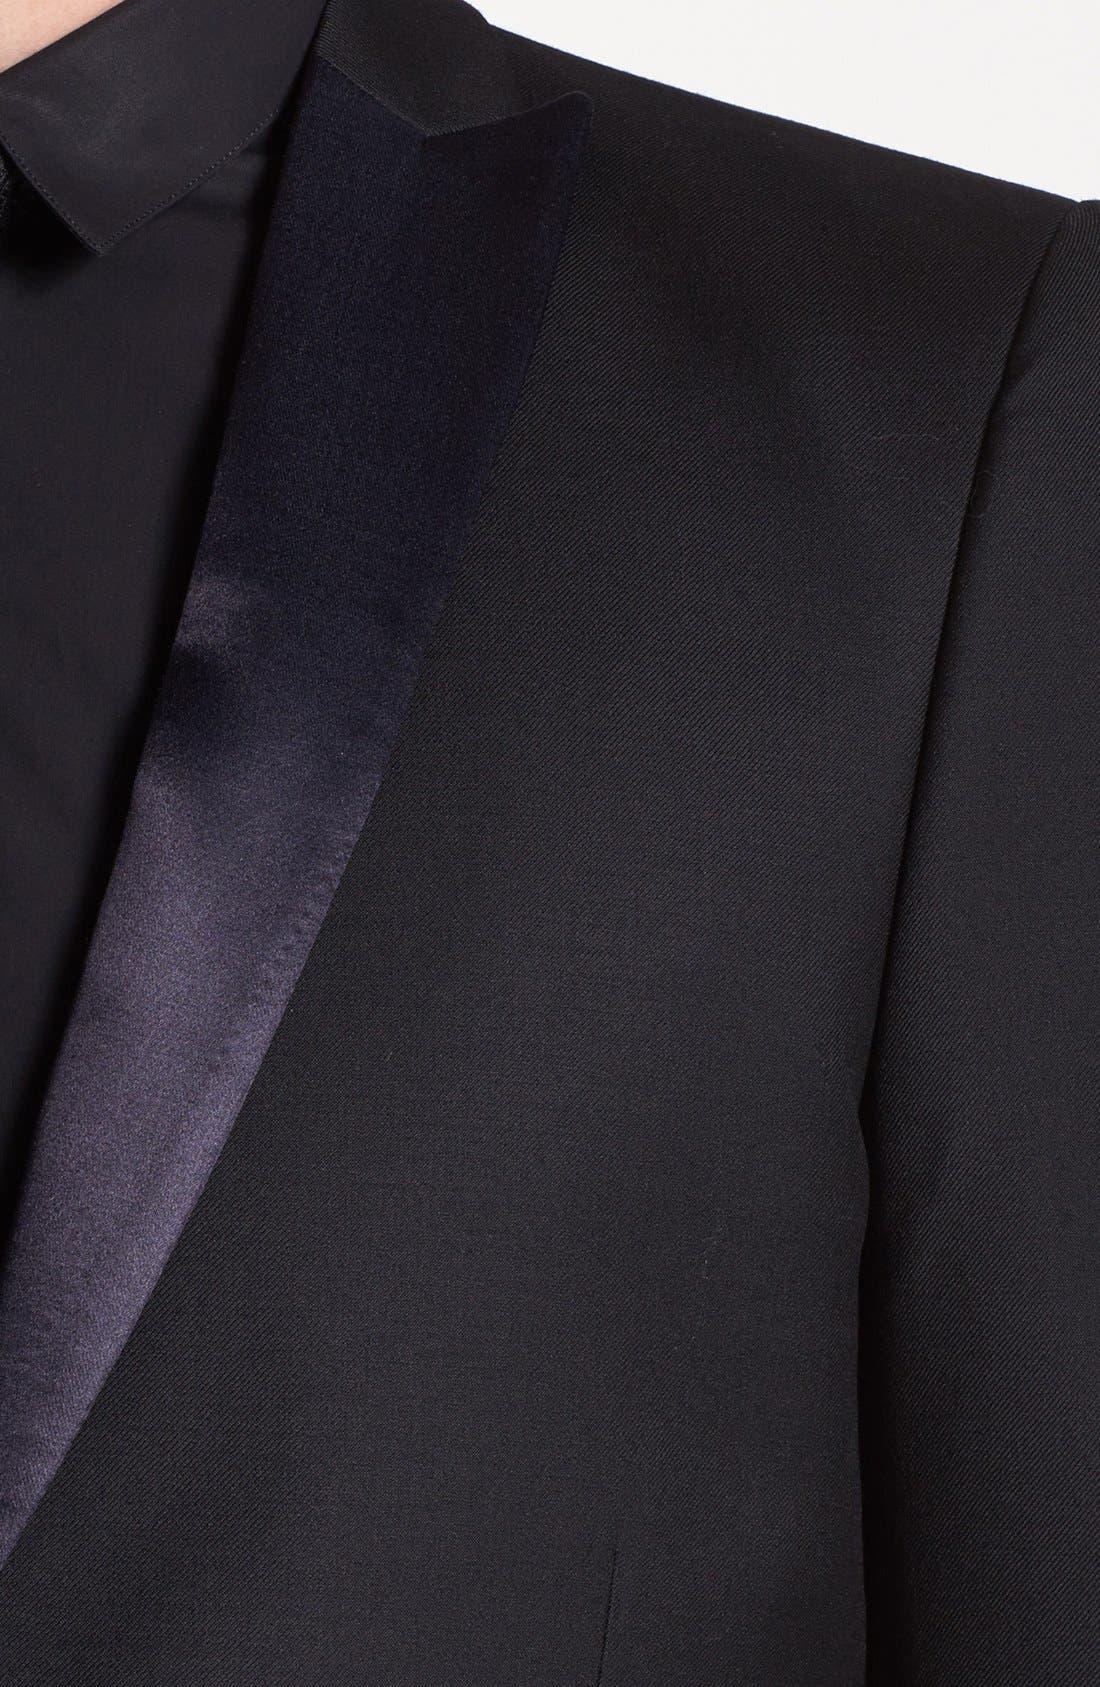 Alternate Image 2  - The Kooples Trim Fit Black Wool Tuxedo Jacket